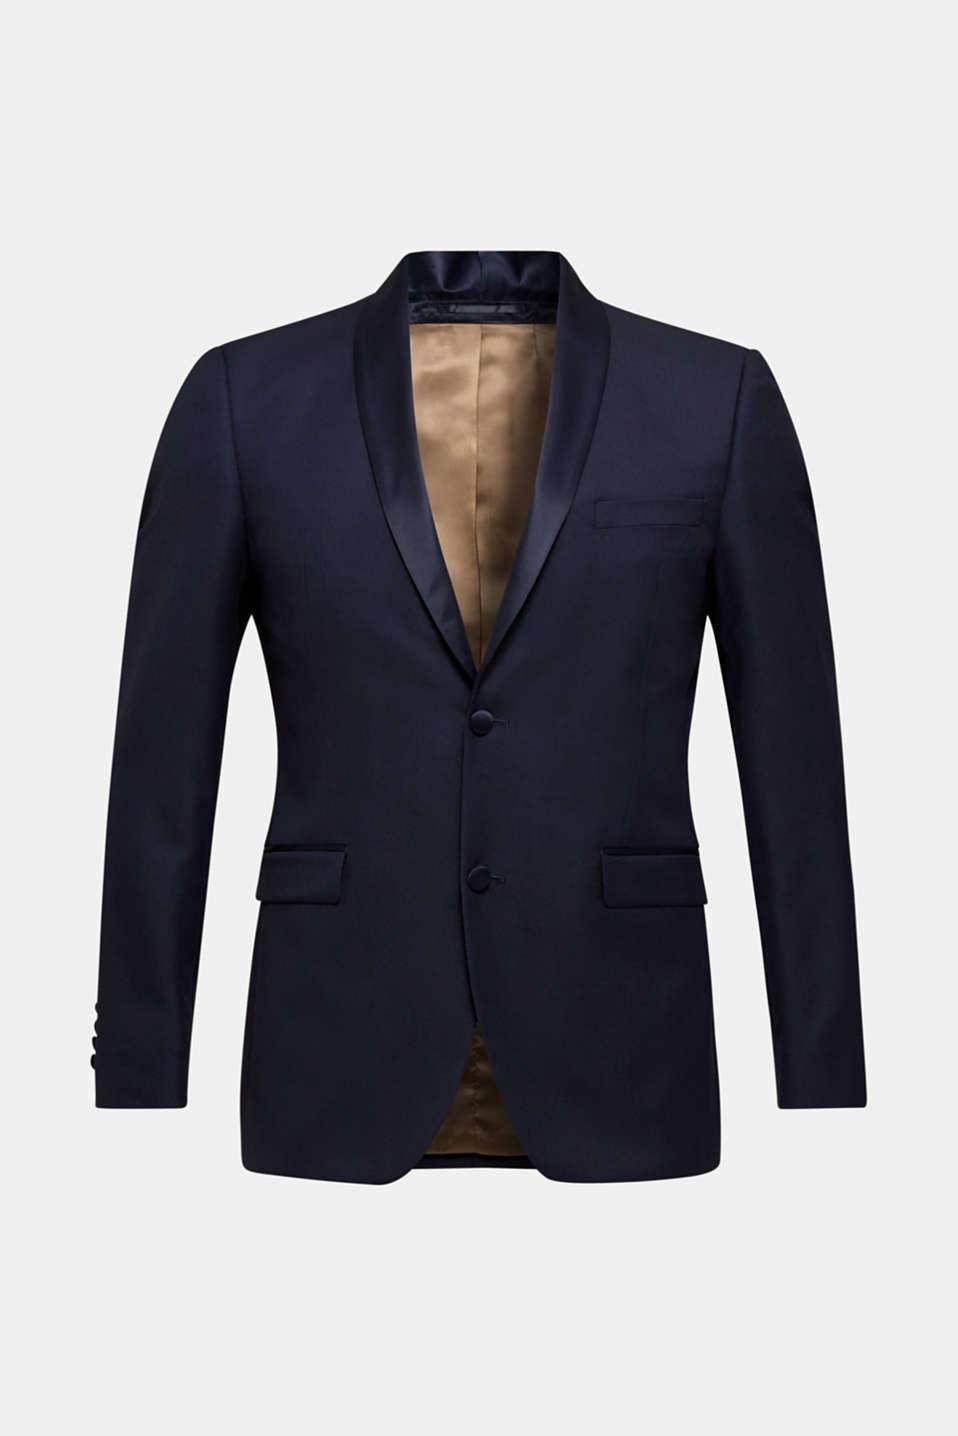 BLUE DINNER JACKET Mix + Match: sports jacket, NAVY, detail image number 7